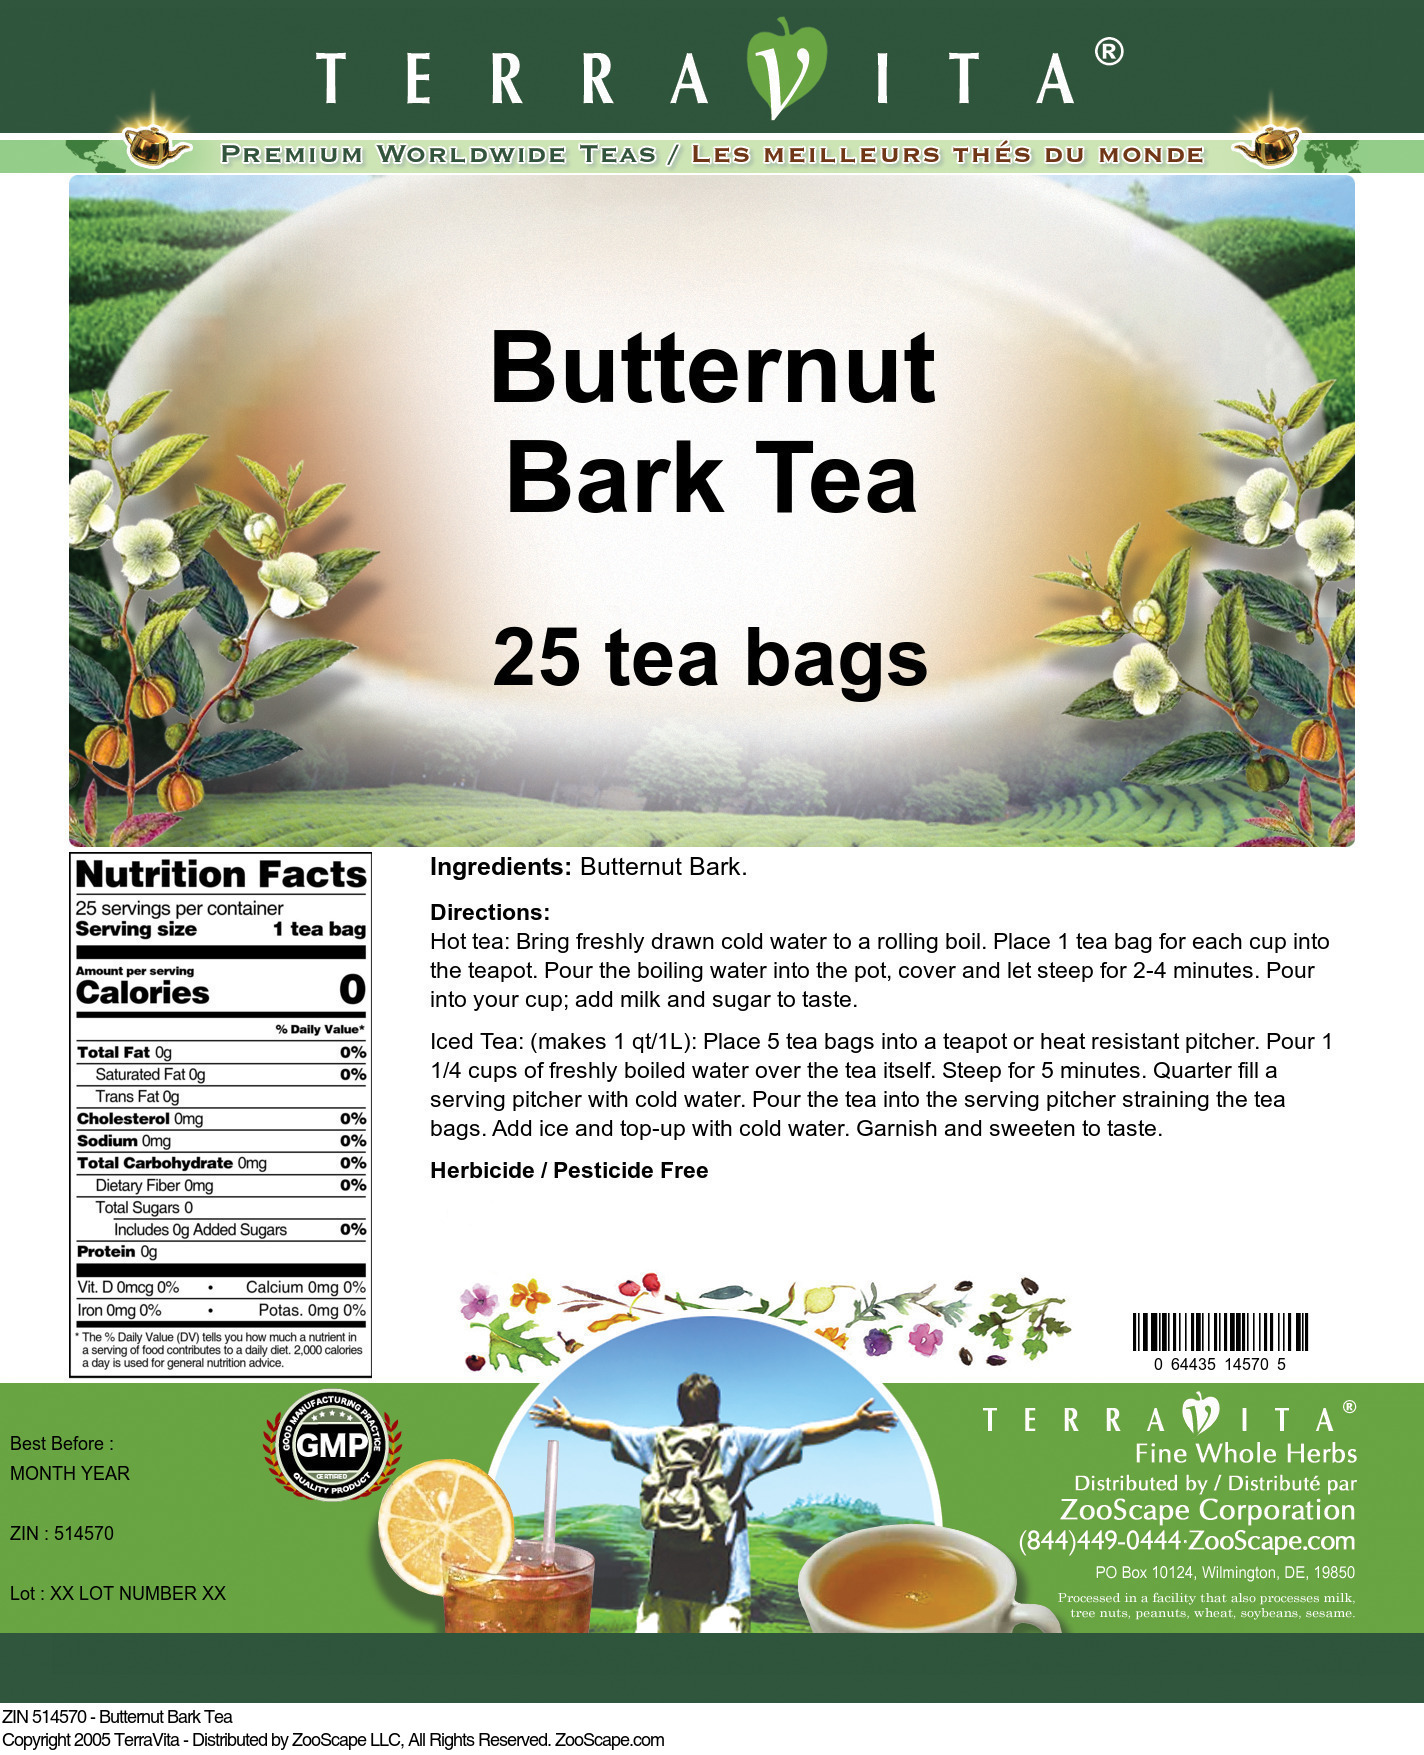 Butternut Bark Tea